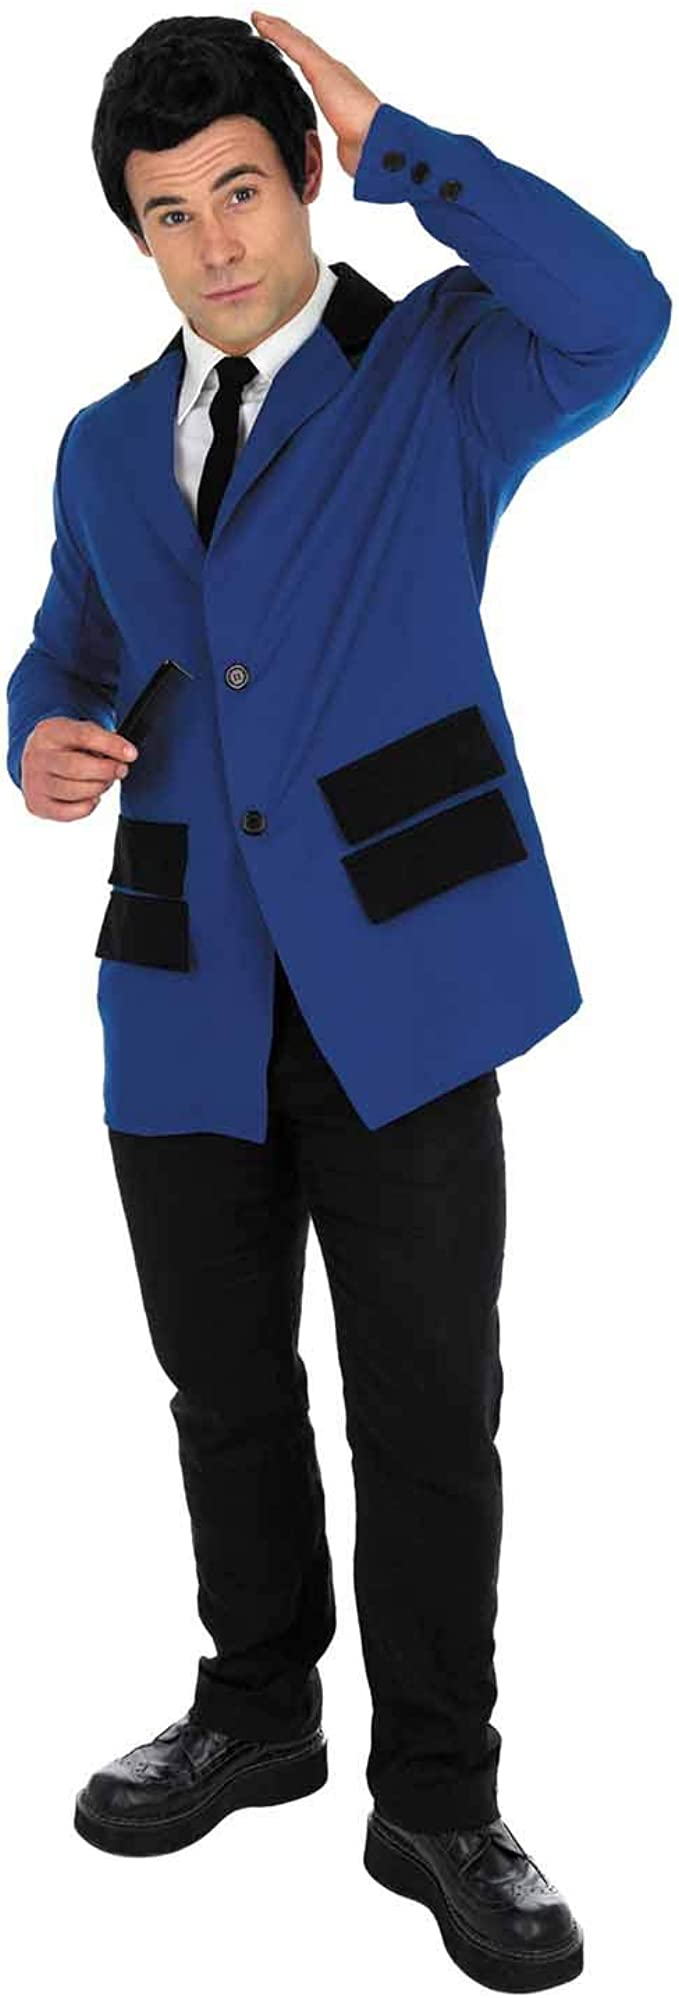 1950s Men's Clothing Fun Shack 50s Costume Men Blue Adult Halloween Costume Available In Medium Large XL  AT vintagedancer.com